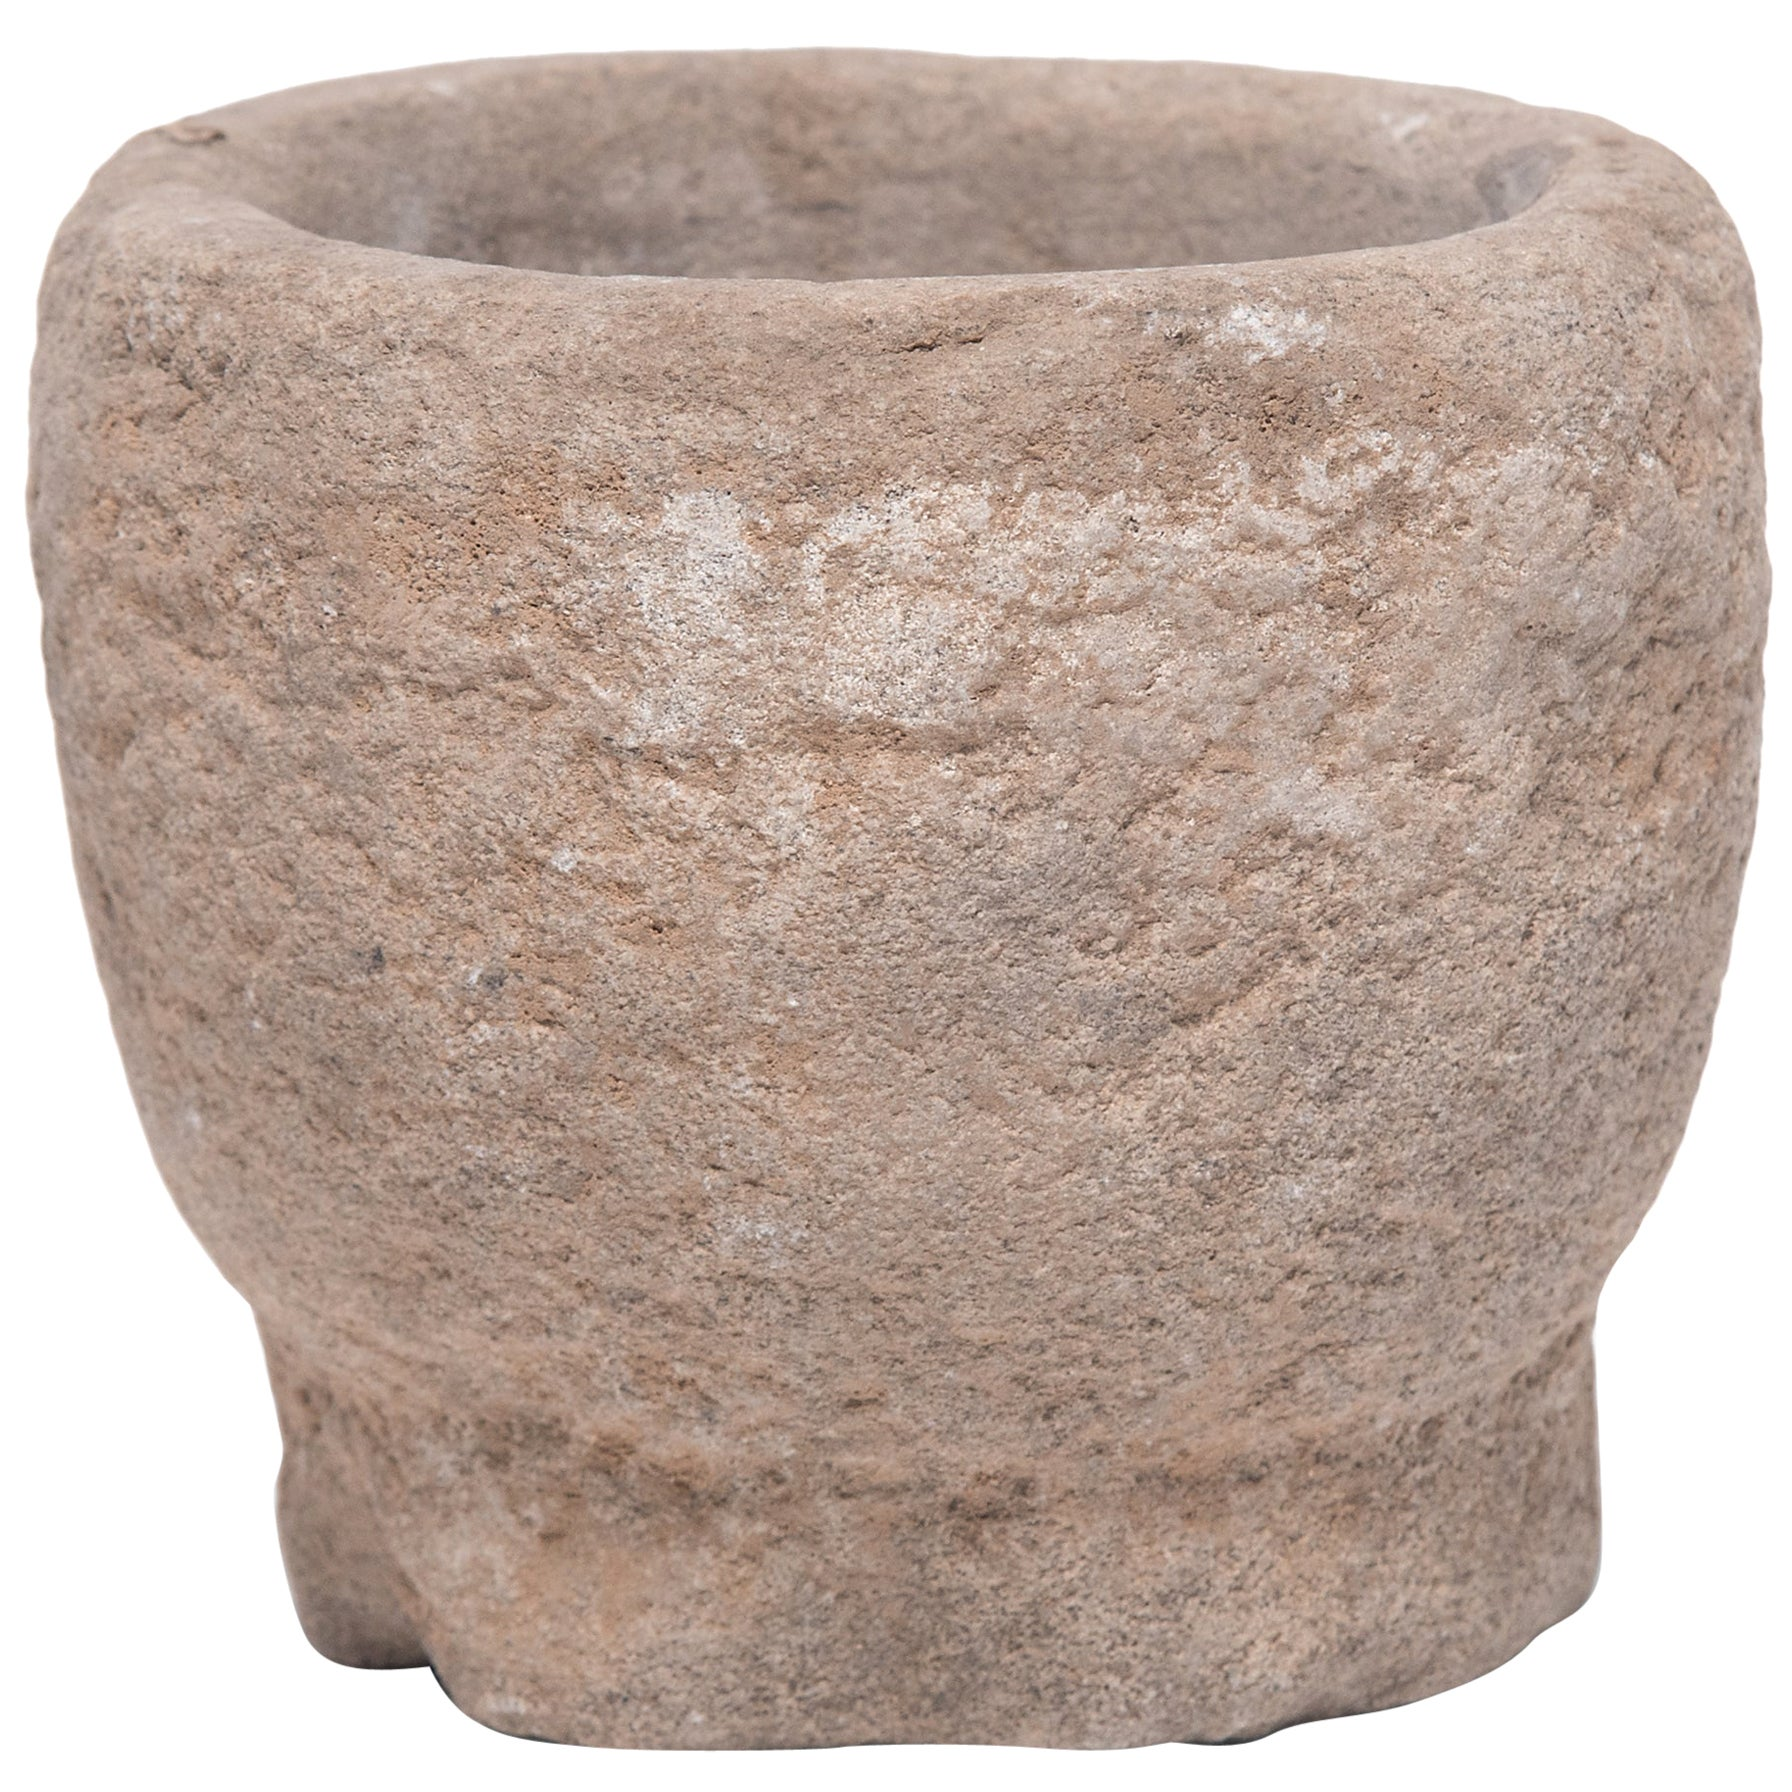 Chinese Stone Garlic Mortar, circa 1900